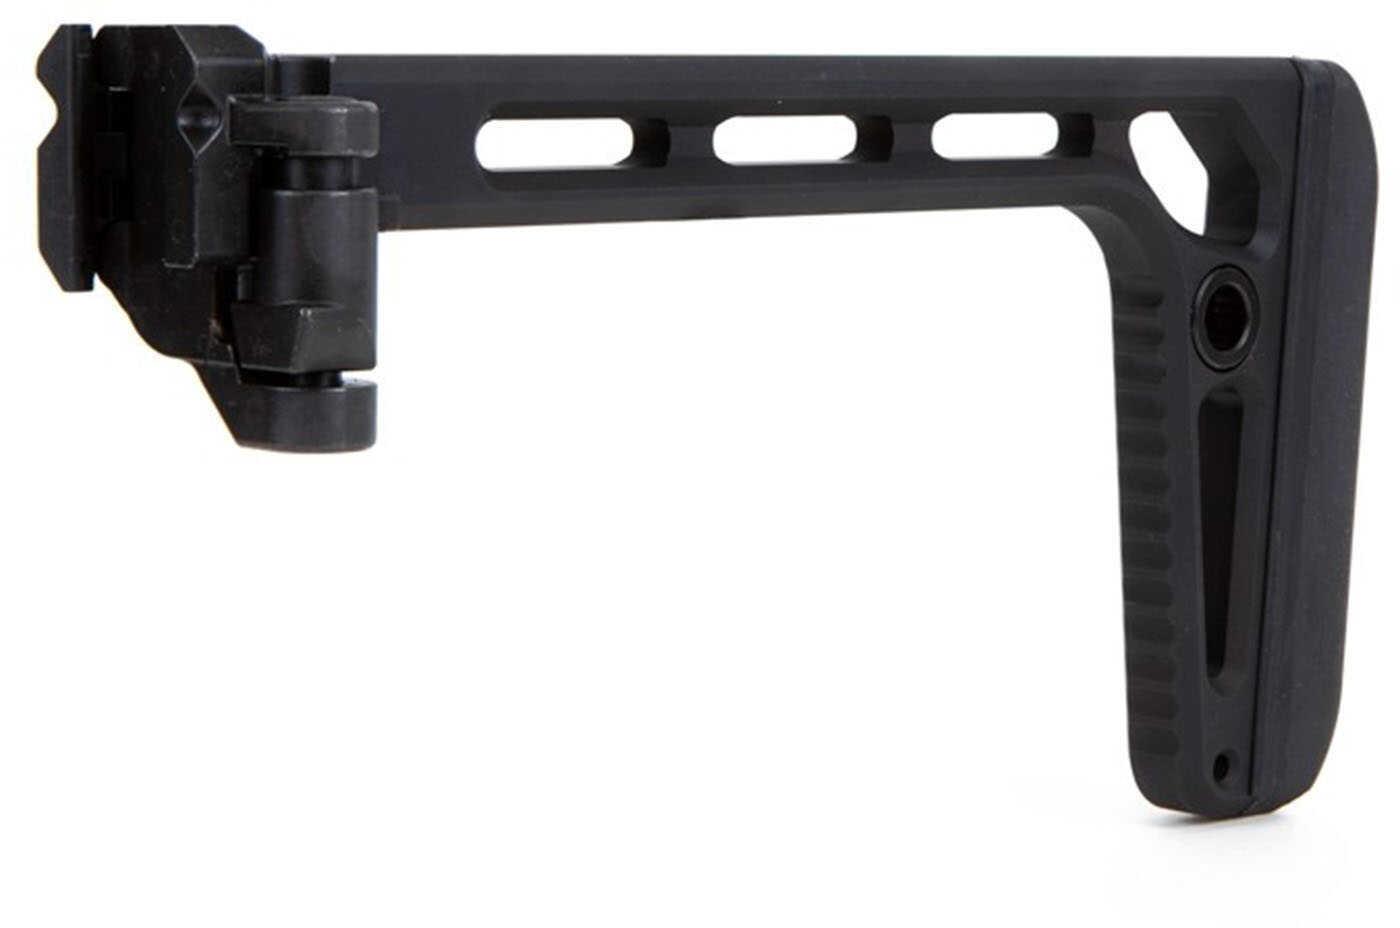 Sig Sauer STOCKXFOLDPLUSBLK MCX/MPX Minimalist Plus Folding Stock AR Platform Rifle Polymer Black